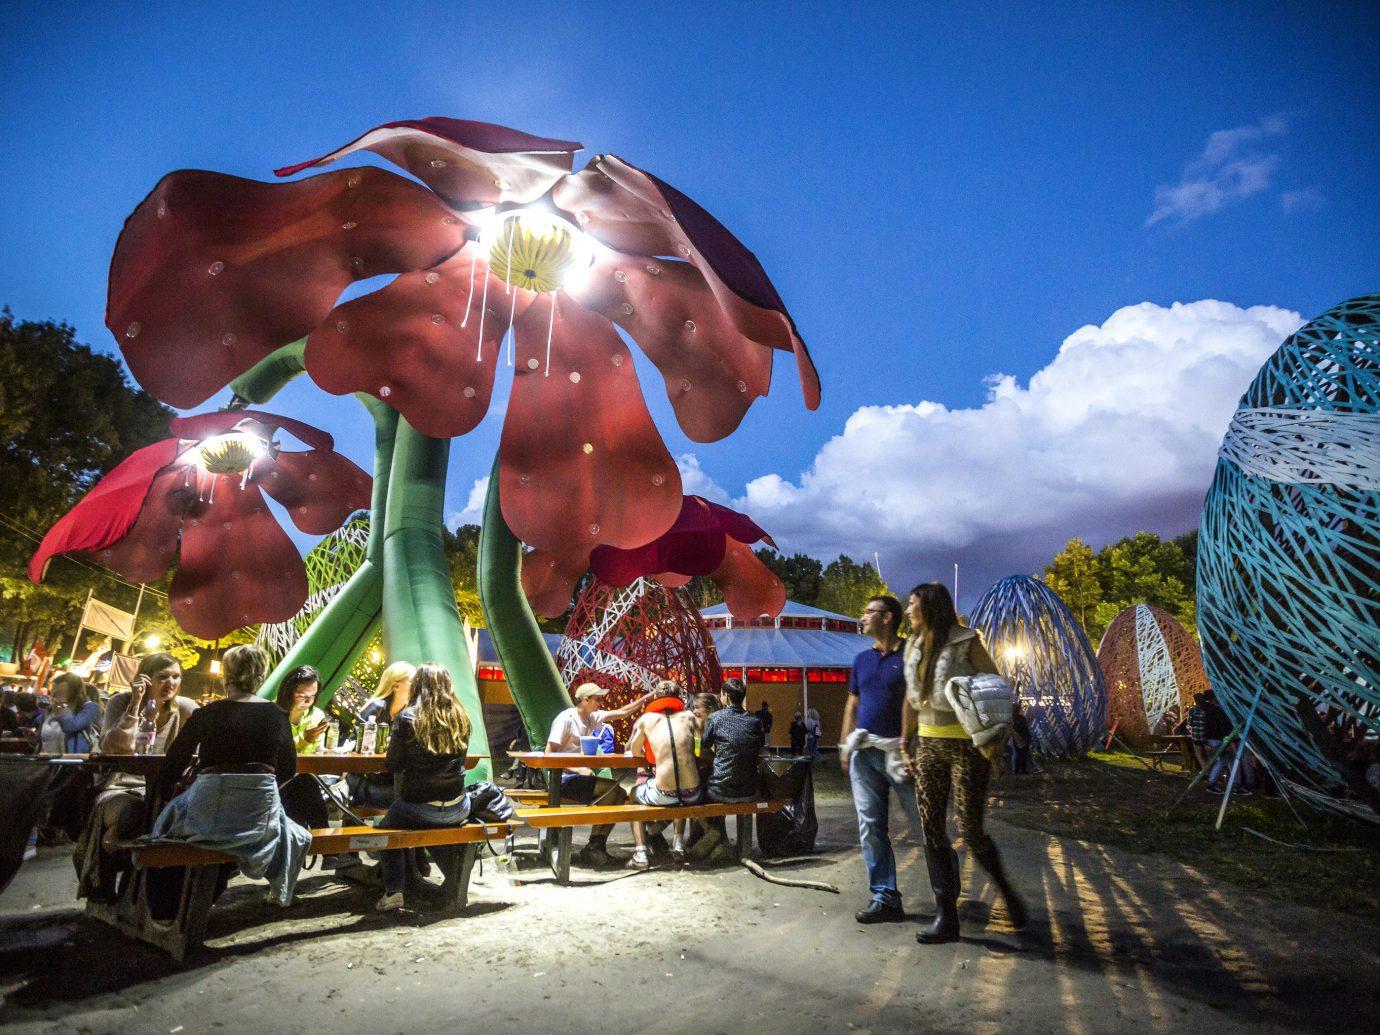 Arts + Culture sky color outdoor atmosphere of earth festival amusement park